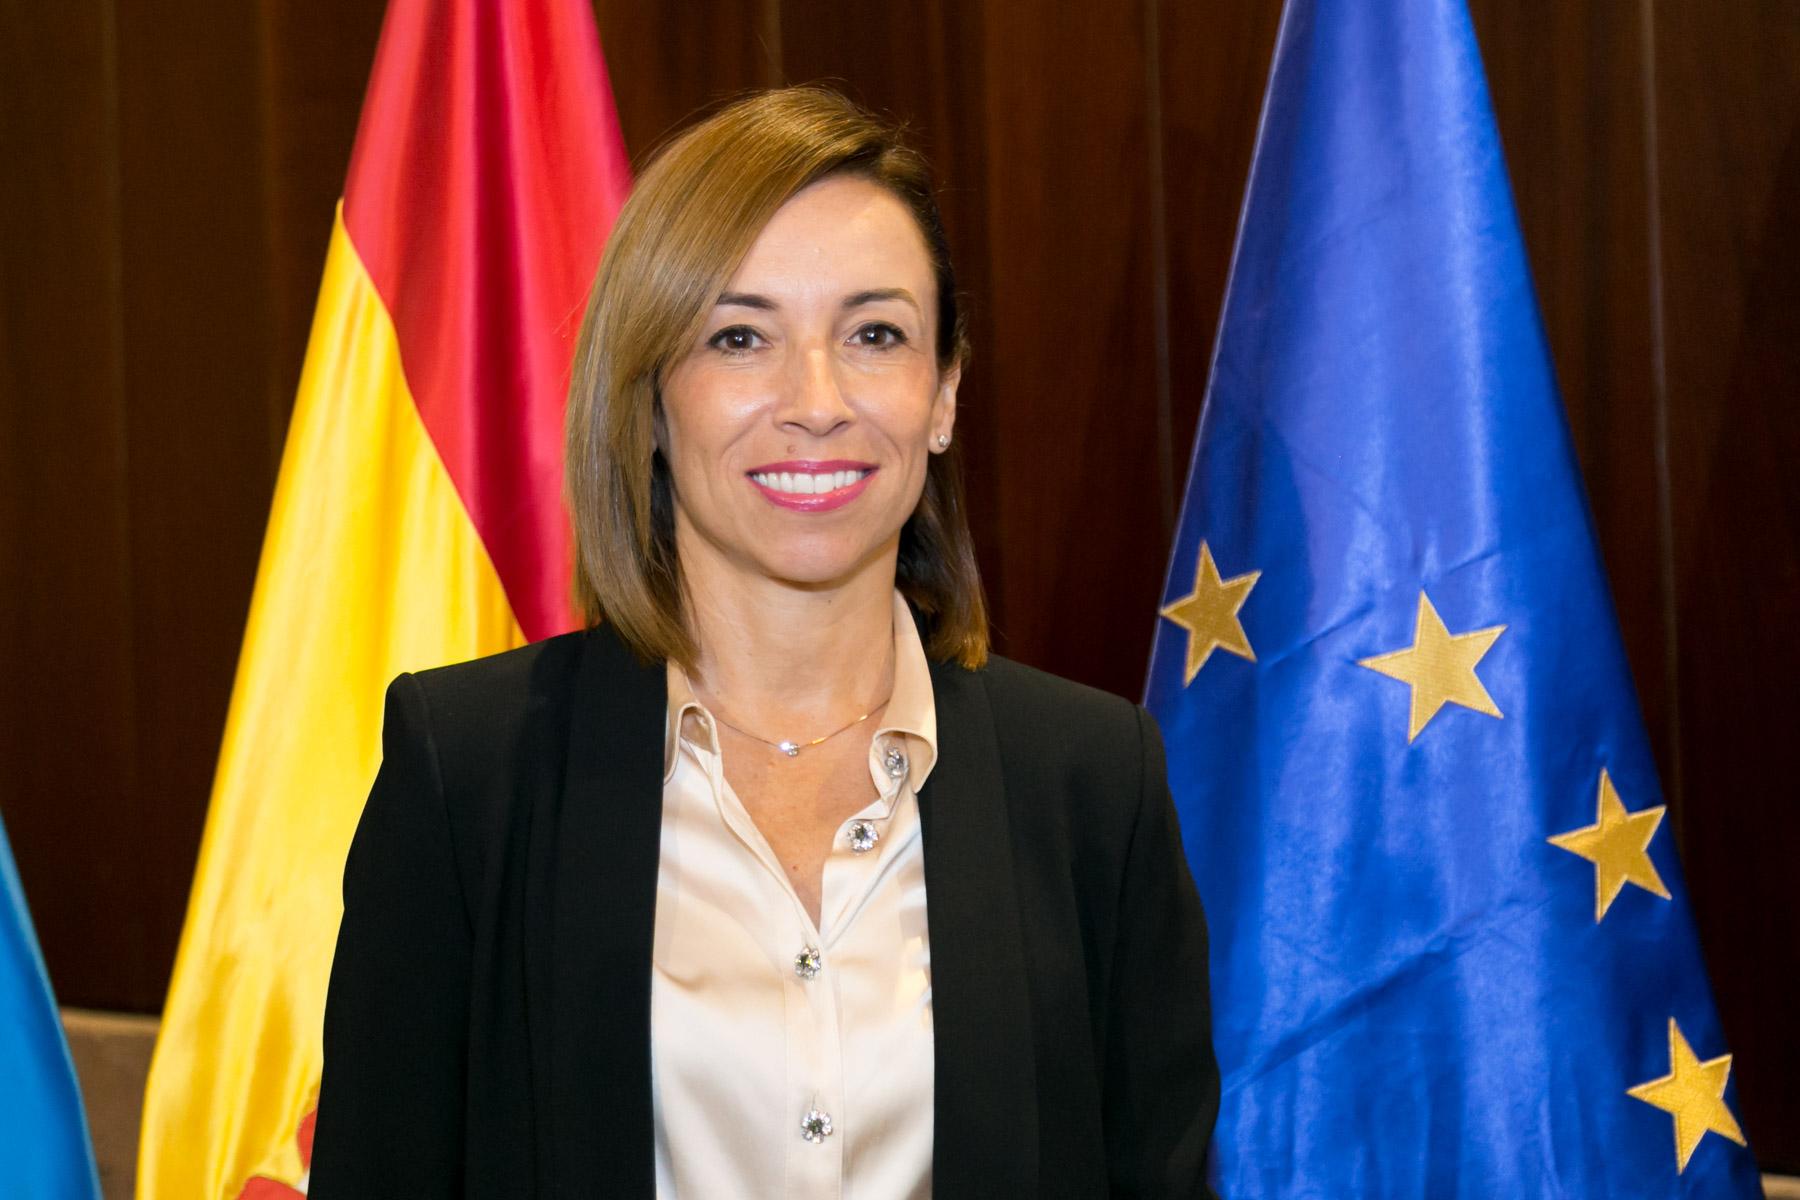 La directora general de Energía, Rosana Melián